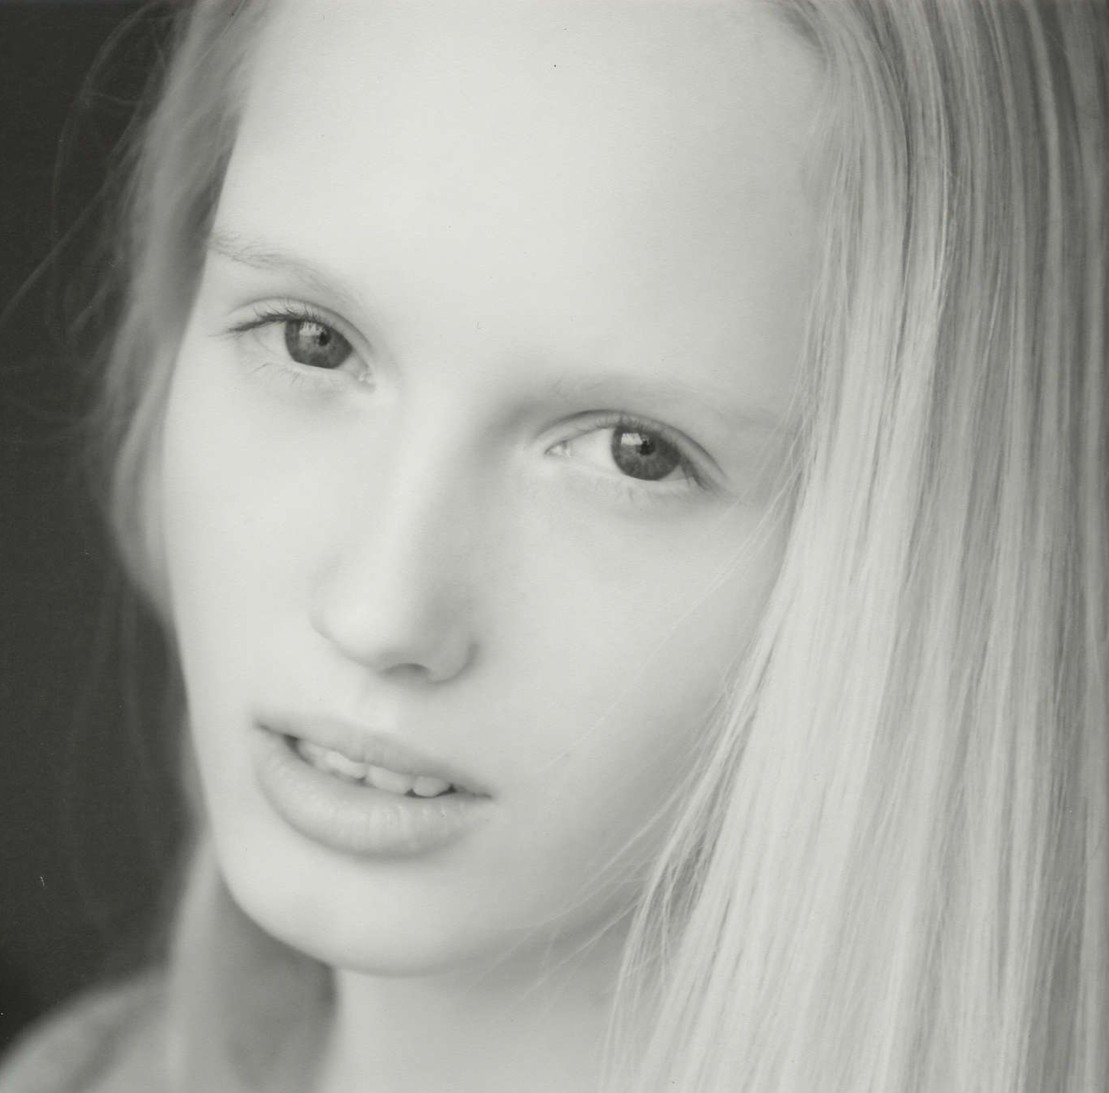 Daria Model | newhairstylesformen2014.com